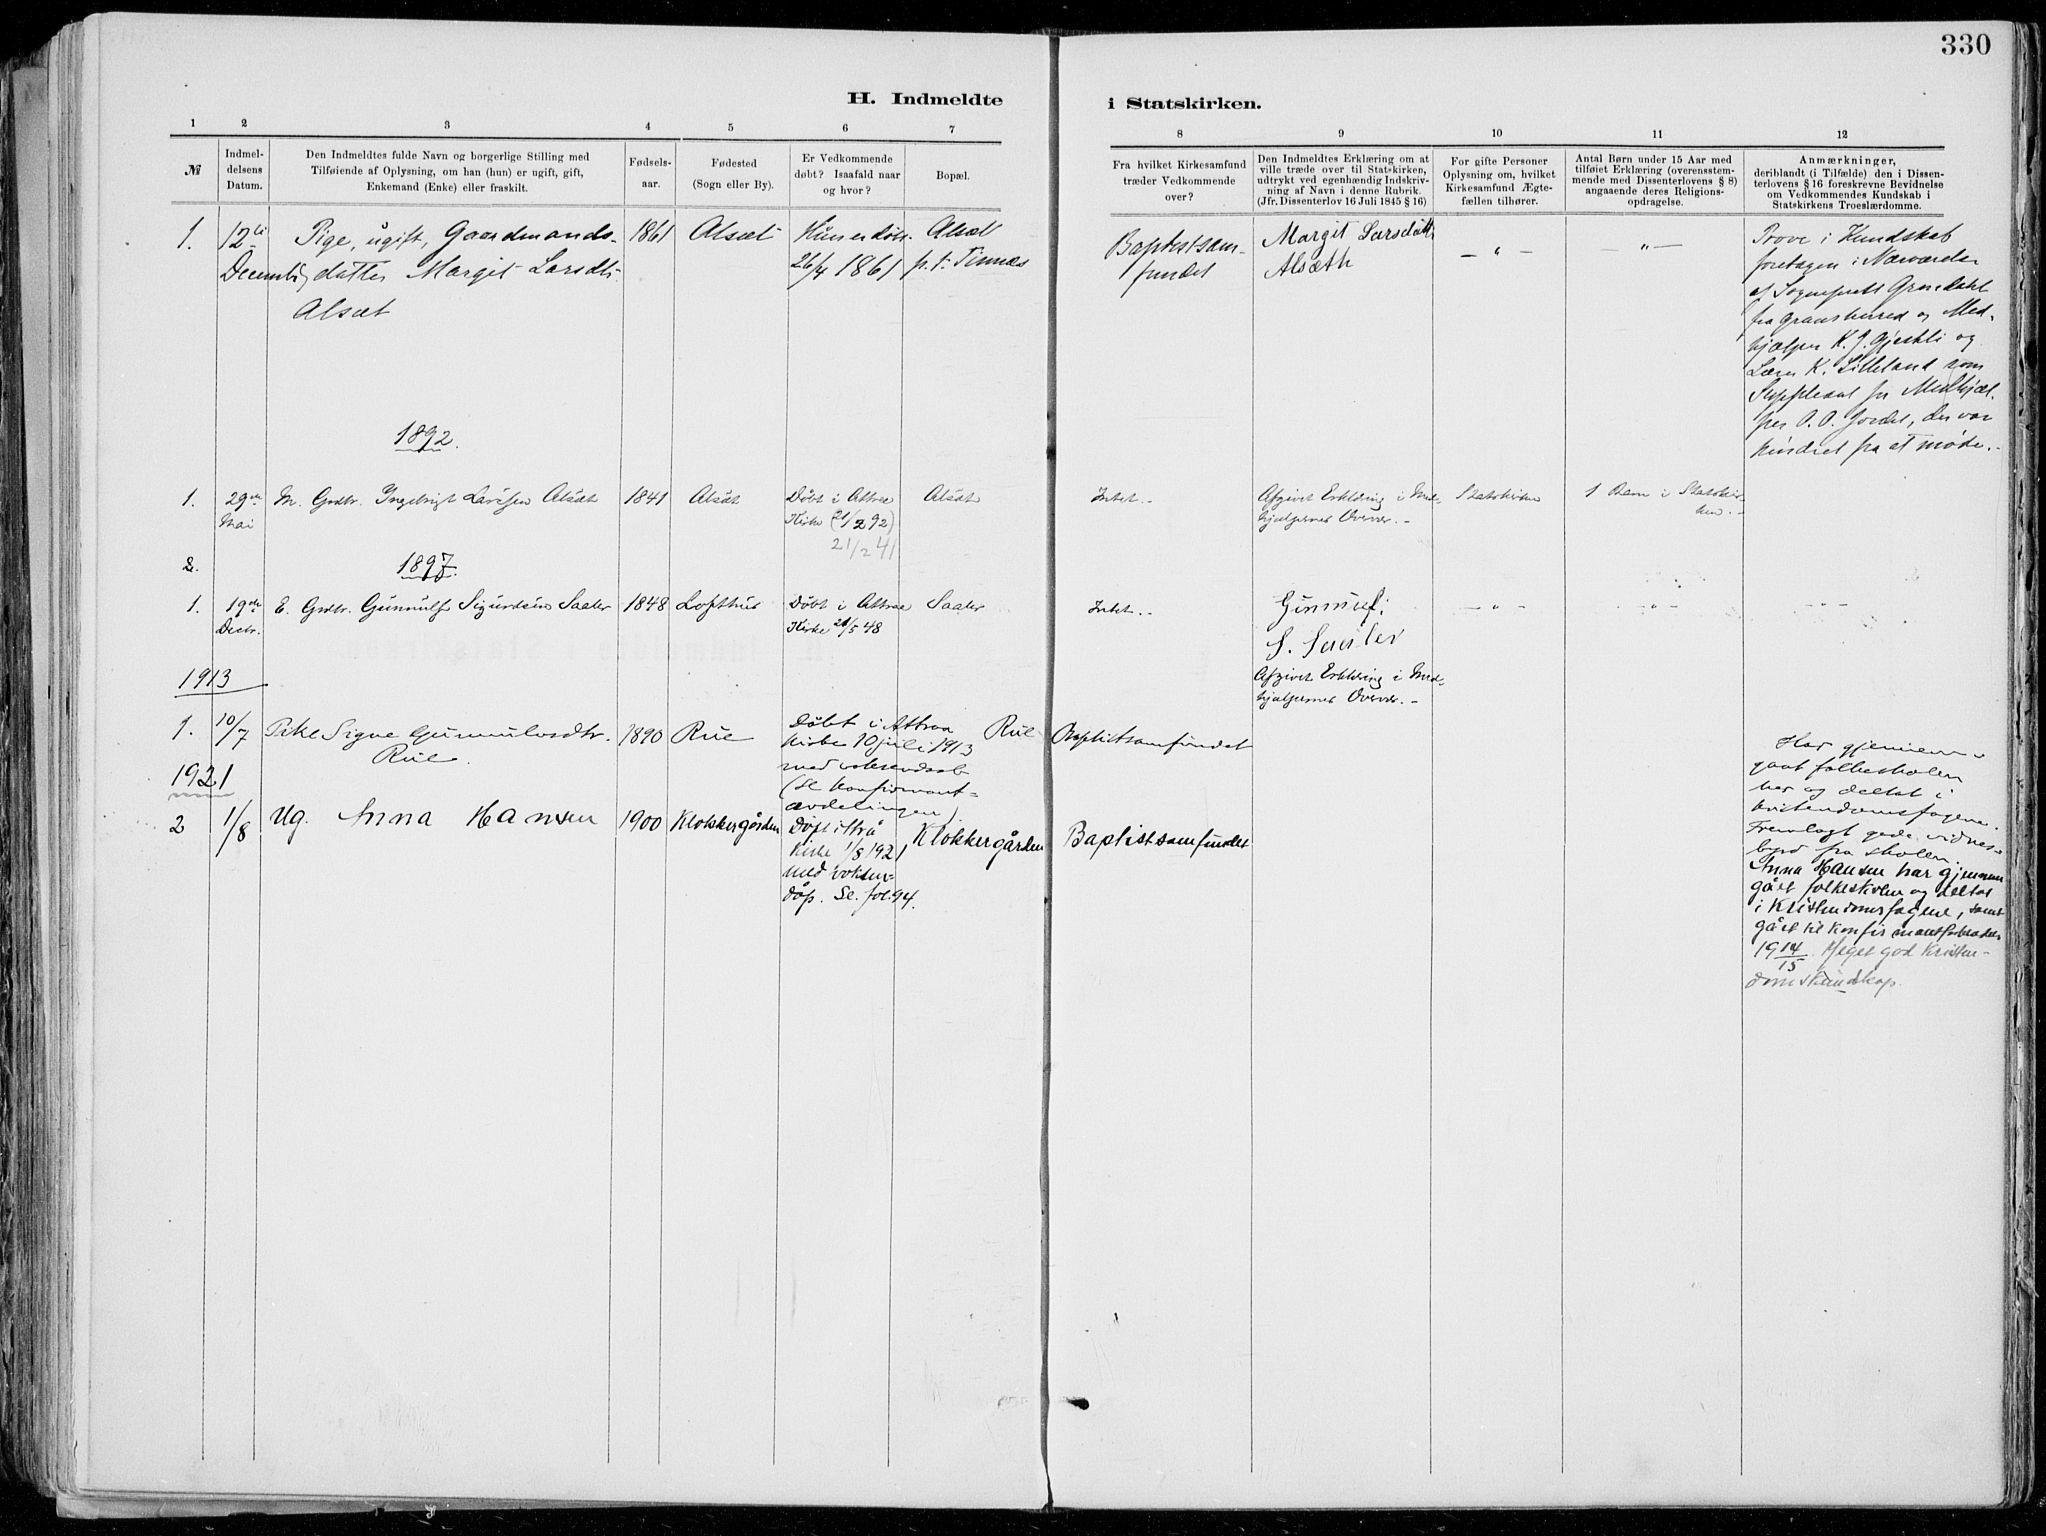 SAKO, Tinn kirkebøker, F/Fa/L0007: Ministerialbok nr. I 7, 1878-1922, s. 330